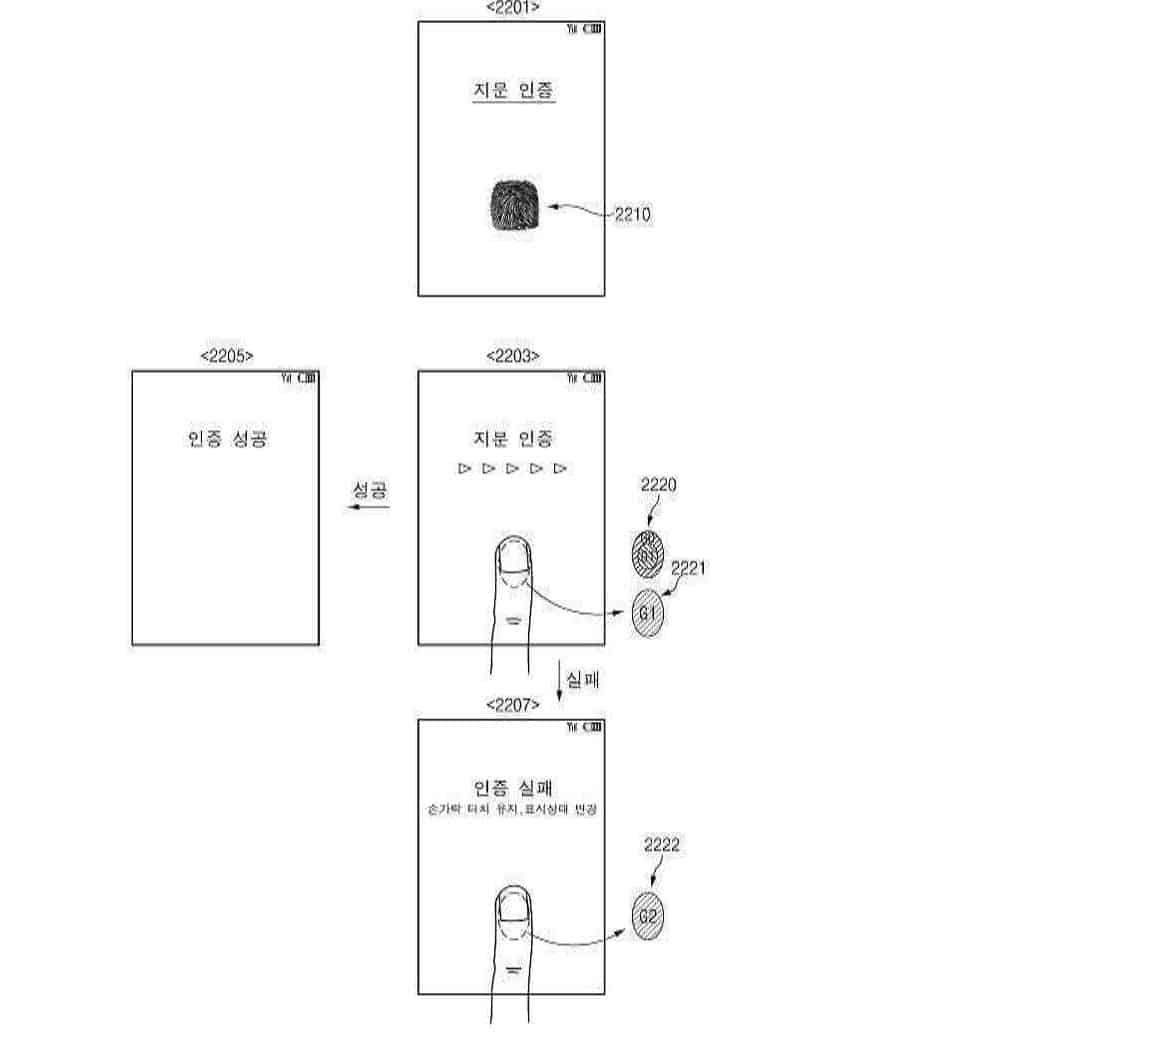 Samsung Pressure Sensitive On screen Fingerprint Reader KIPRIS 6